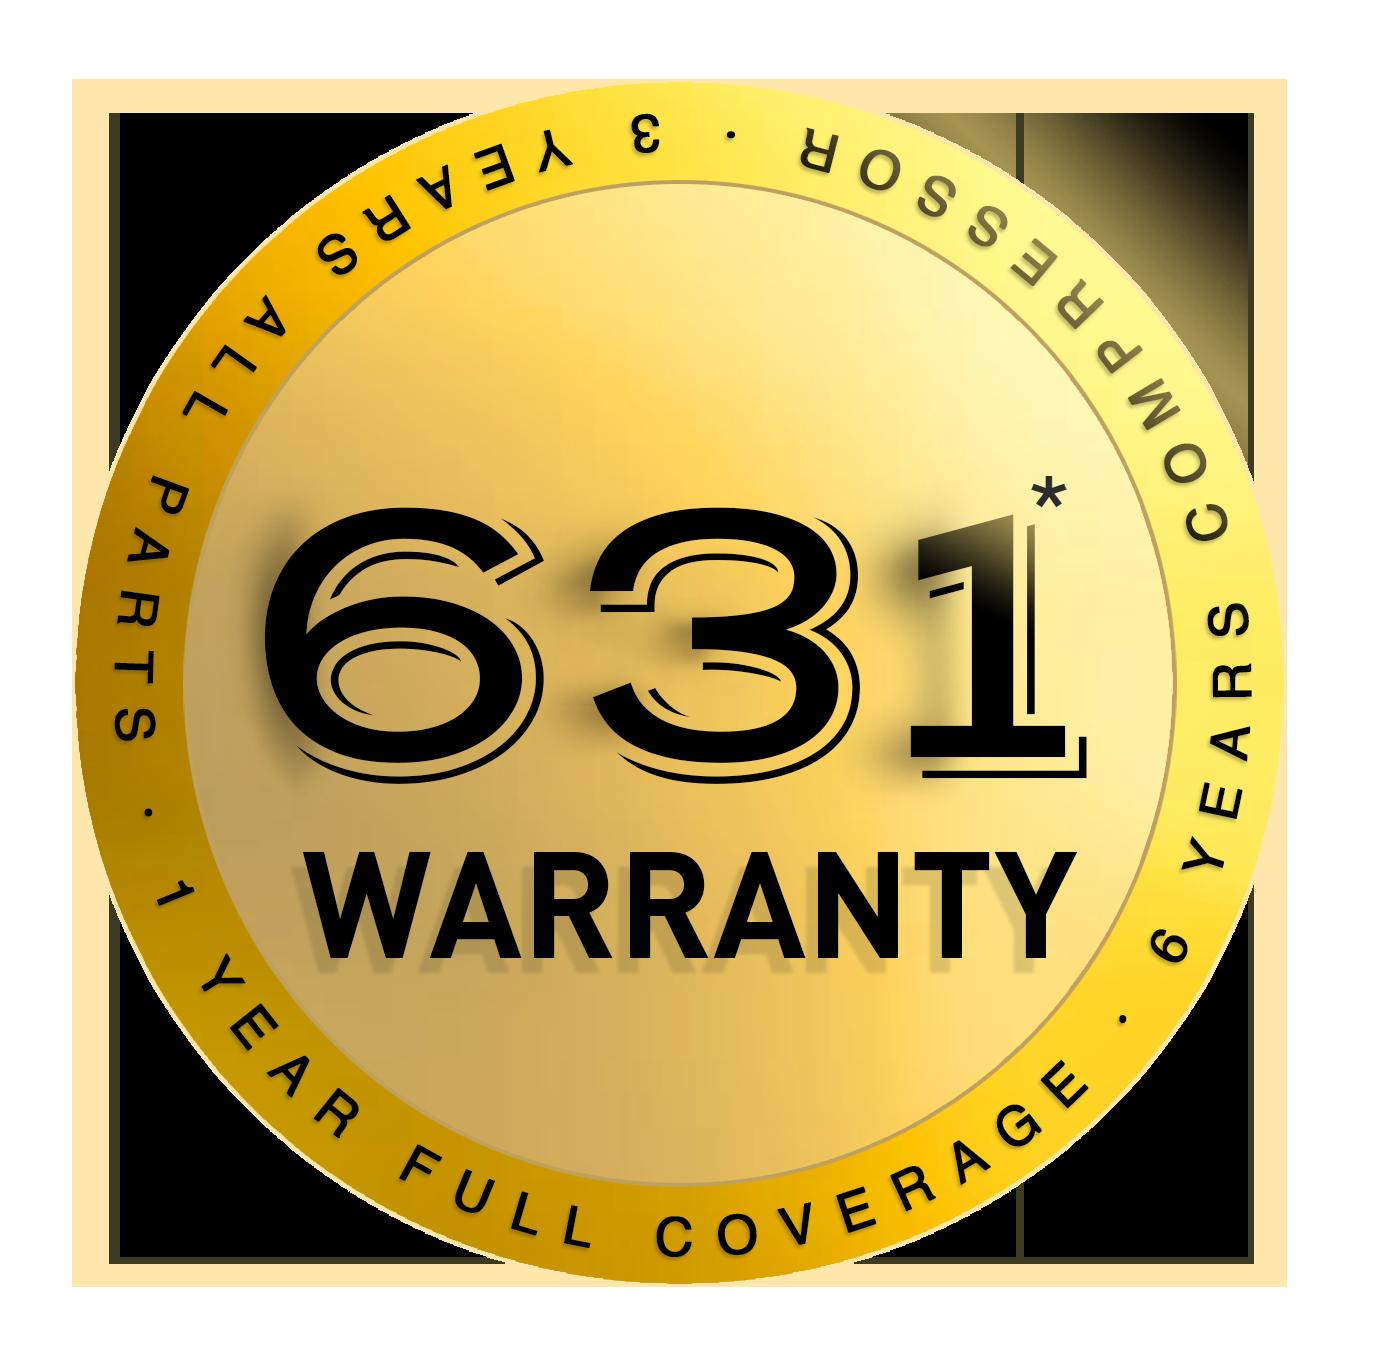 Avolta 631 Warranty